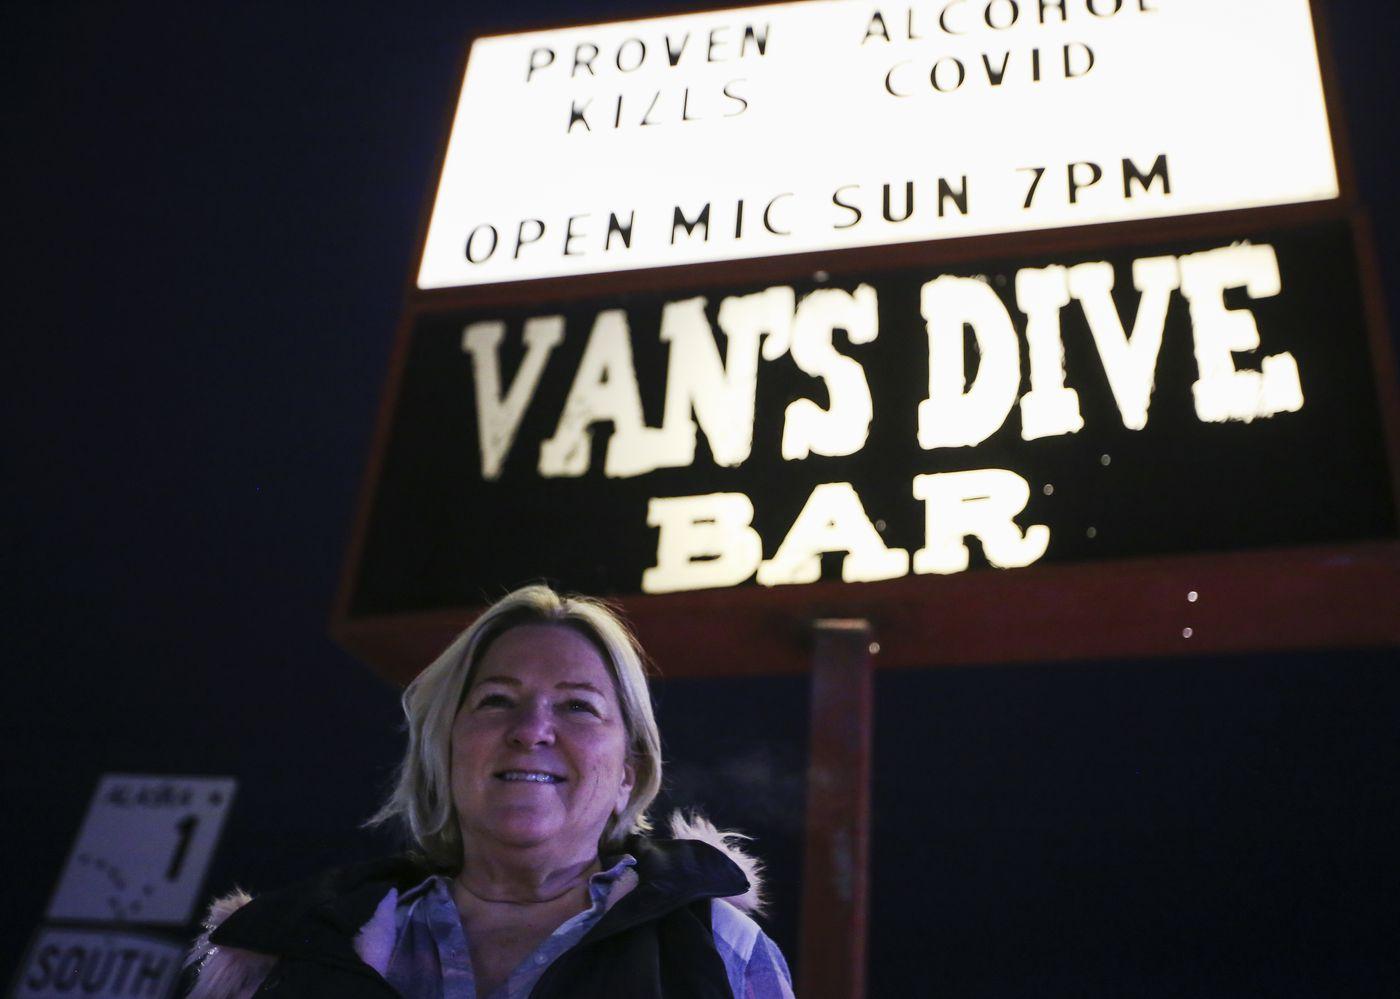 Van's Dive Bar Owner Nicki Hale at the downtown Anchorage bar on Thursday, Jan. 14, 2021. (Emily Mesner / ADN)